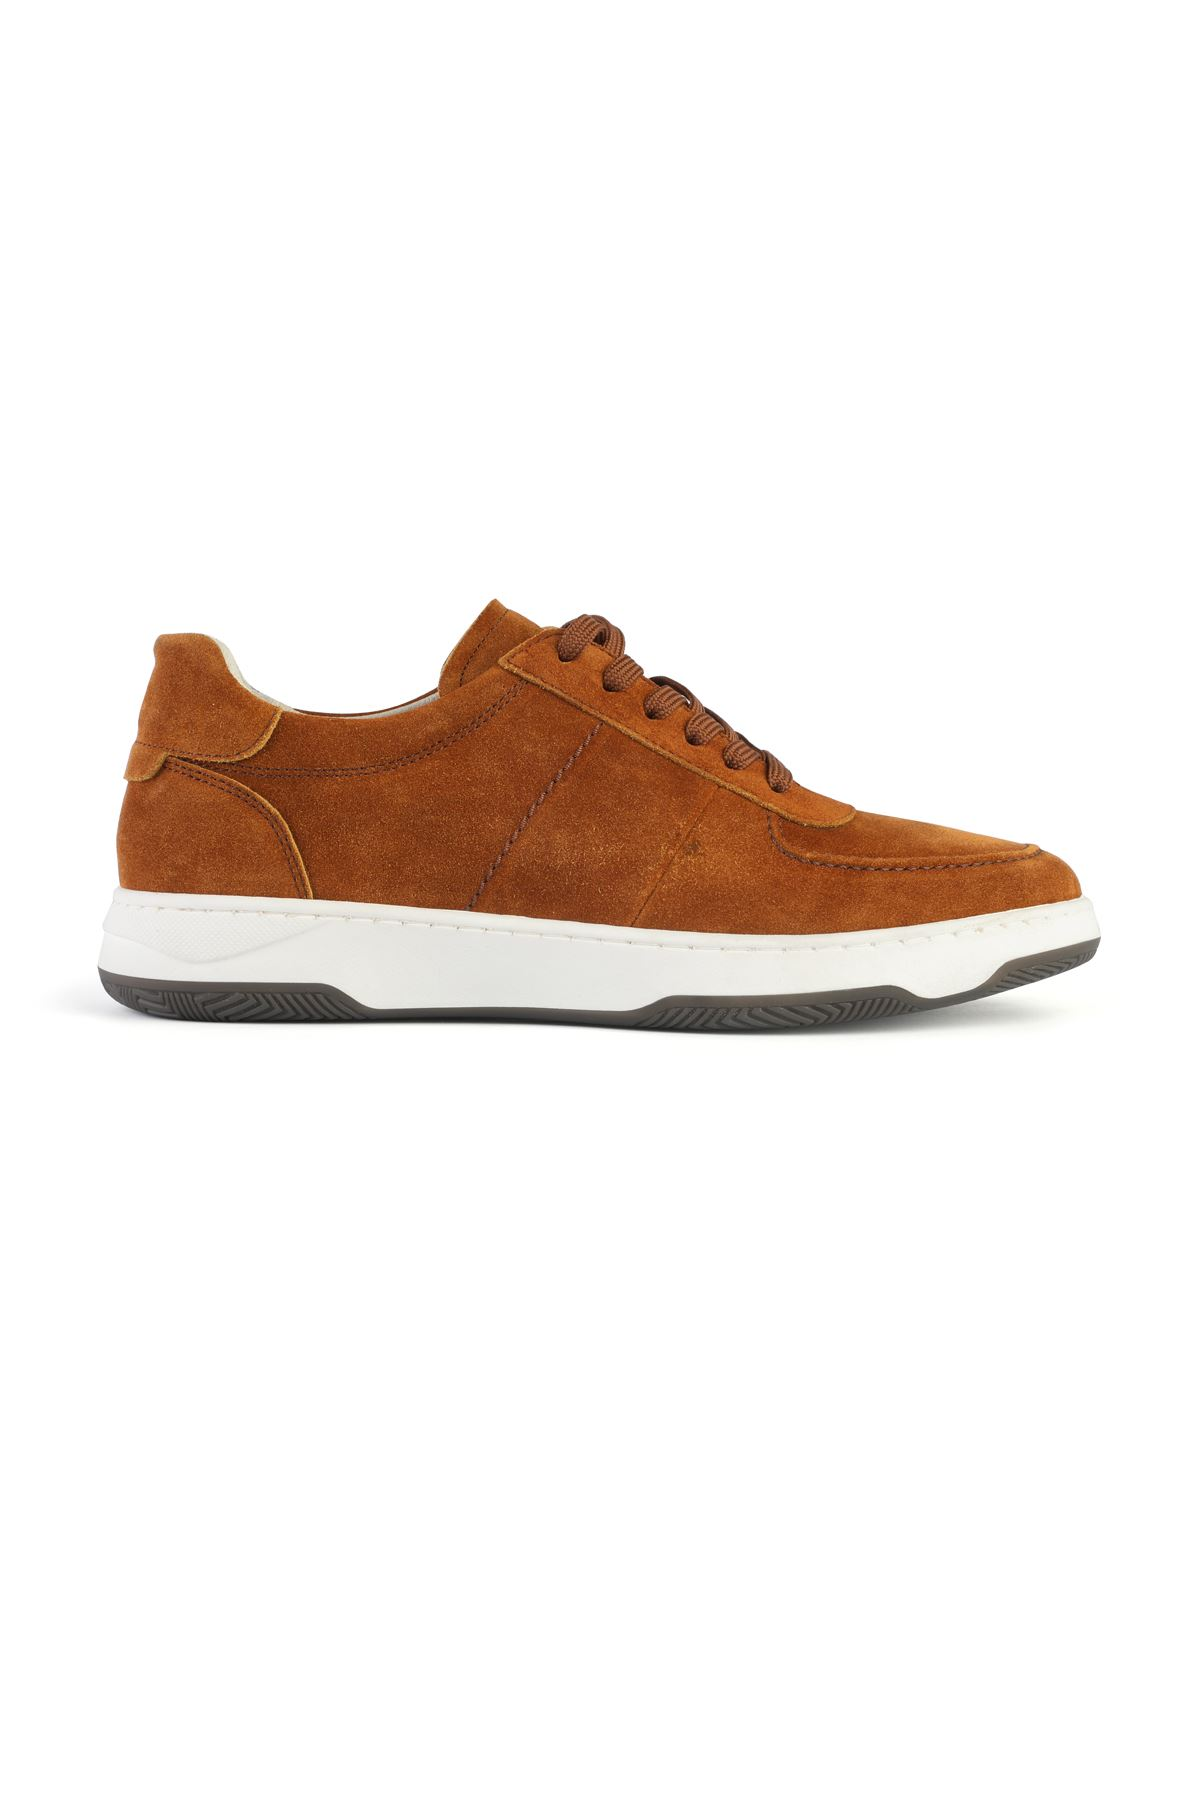 Libero 3228 Tan Sports Shoes